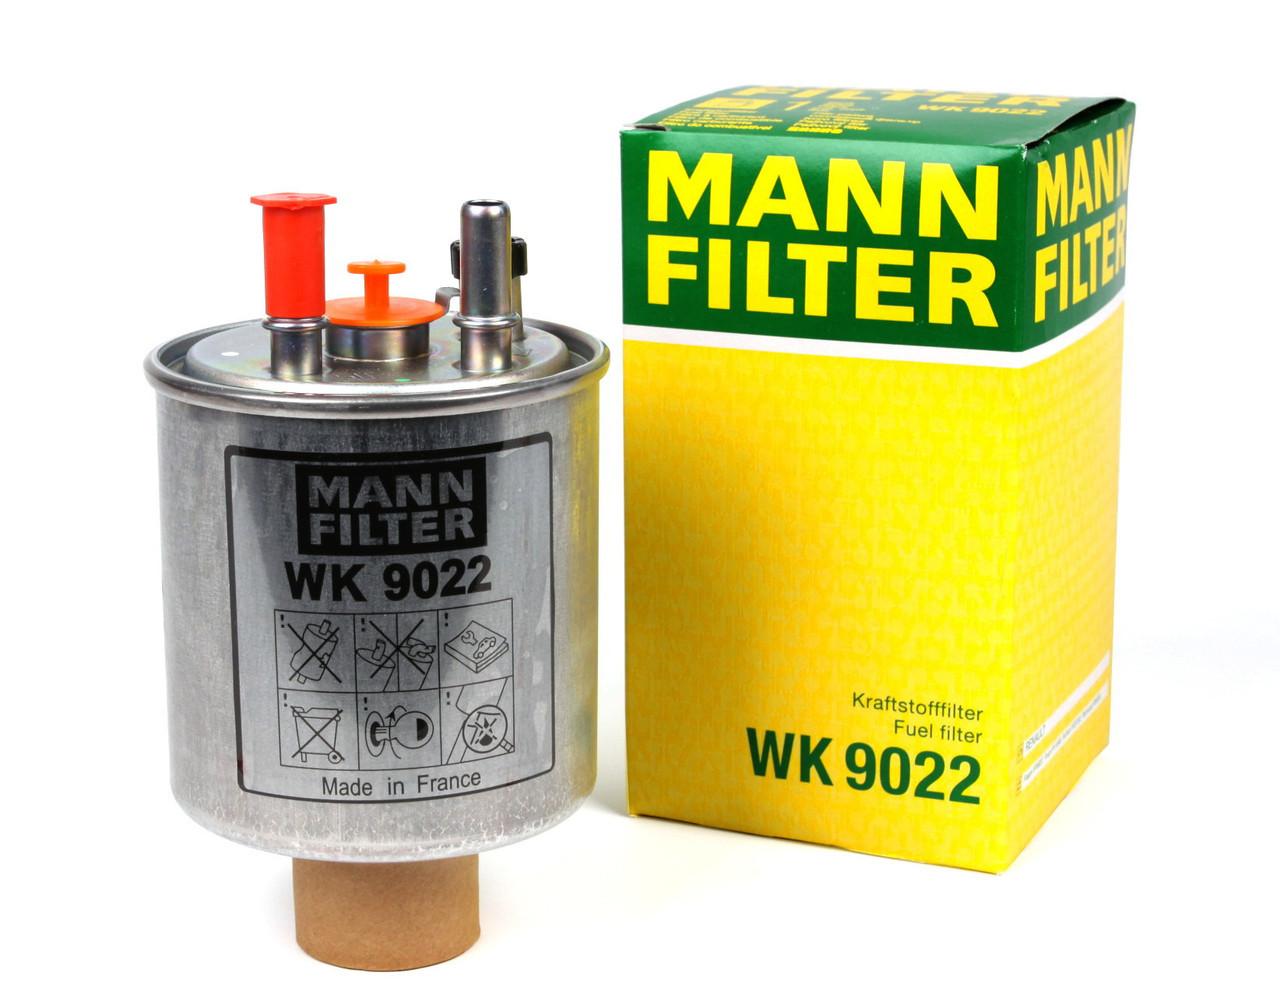 Фильтр очистки топлива Mann WK9022 для автомобилей Renault